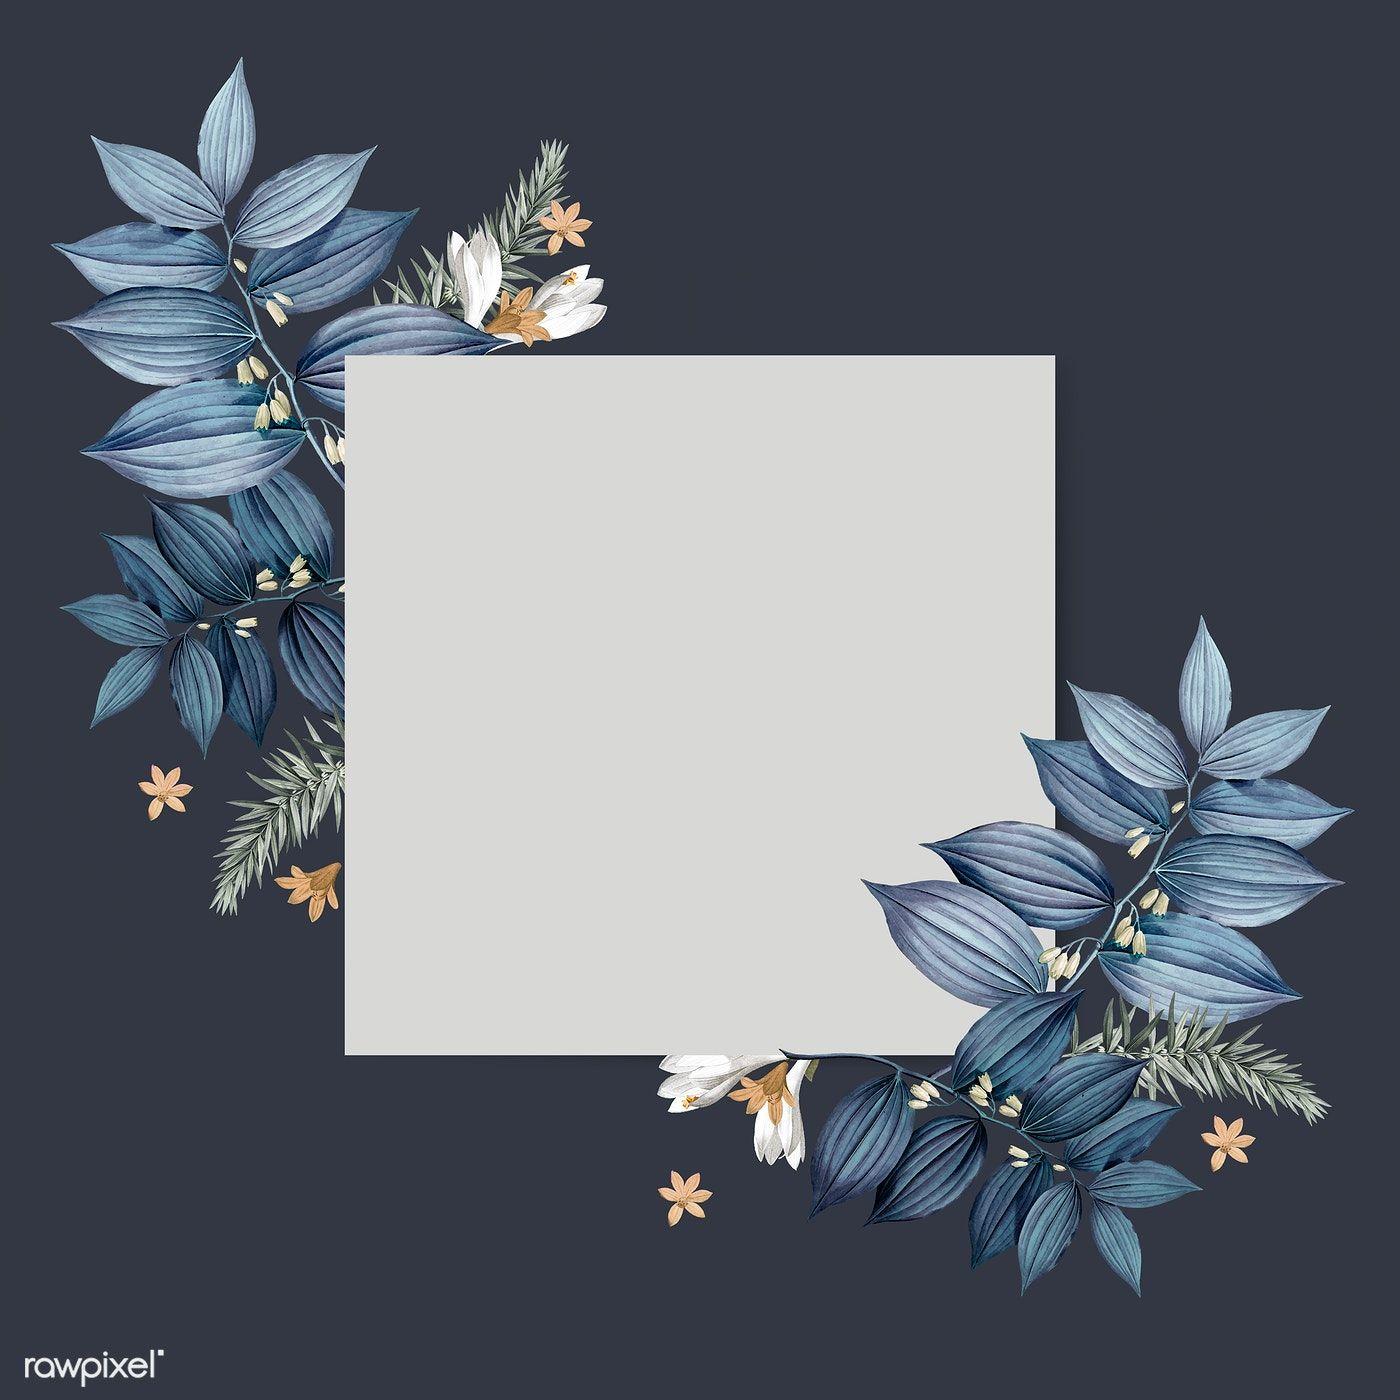 Download Premium Vector Of Empty Floral Frame Design Vector 520449 Blank Card Design Card Design Floral Border Design